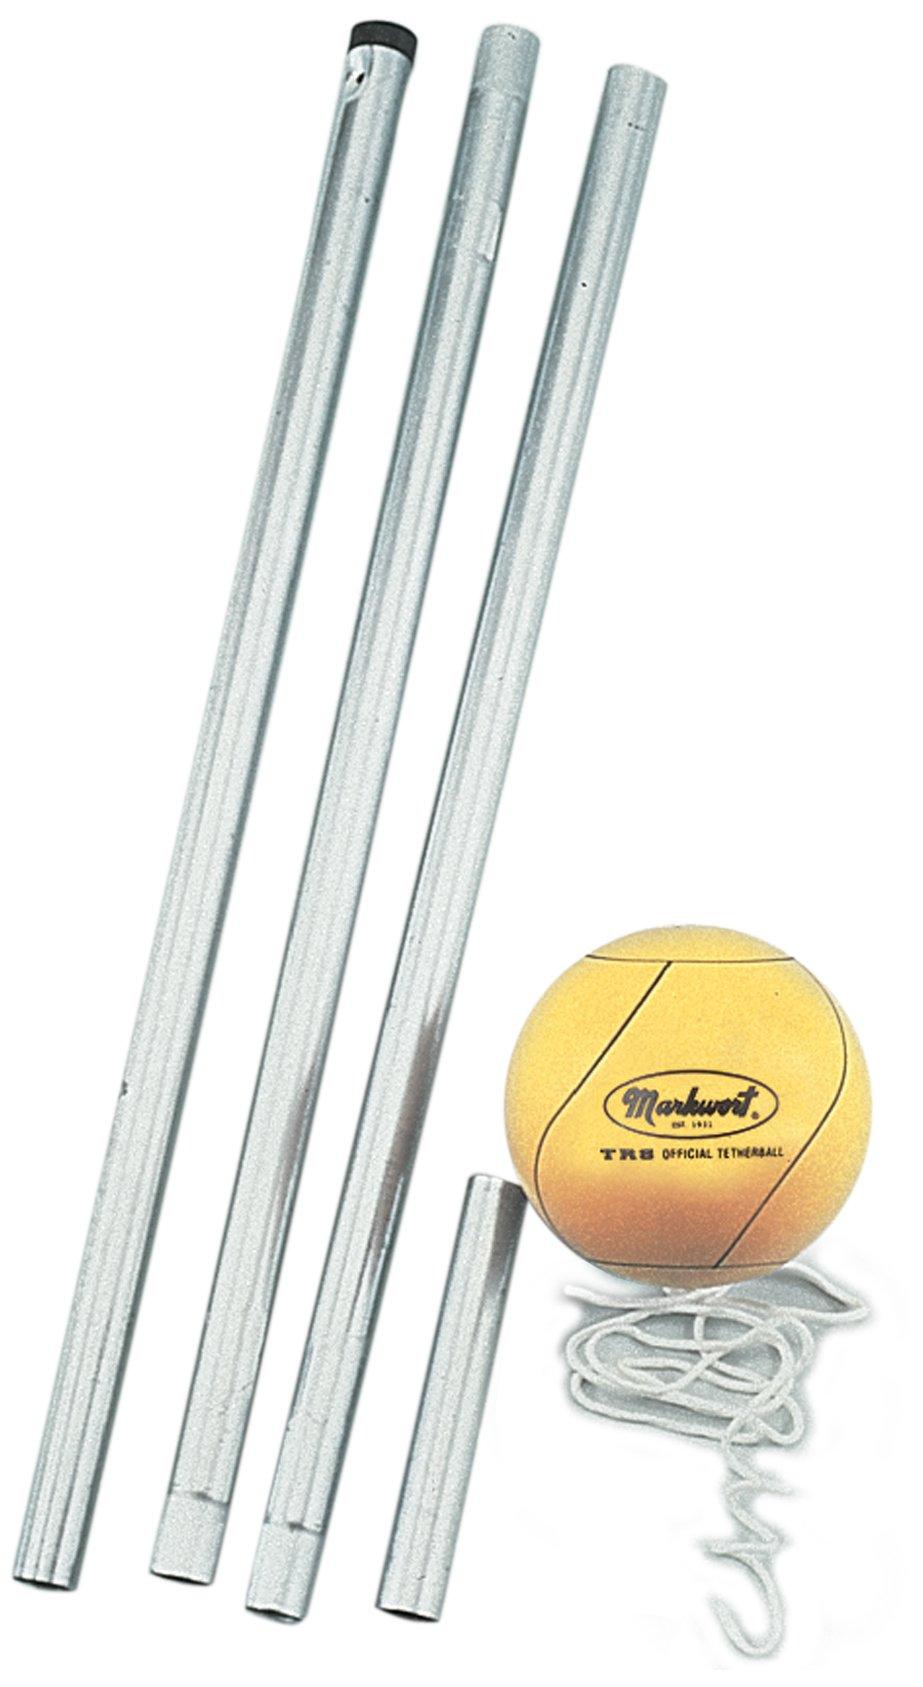 Markwort Official Tetherball Complete Set (9-Foot) by Markwort